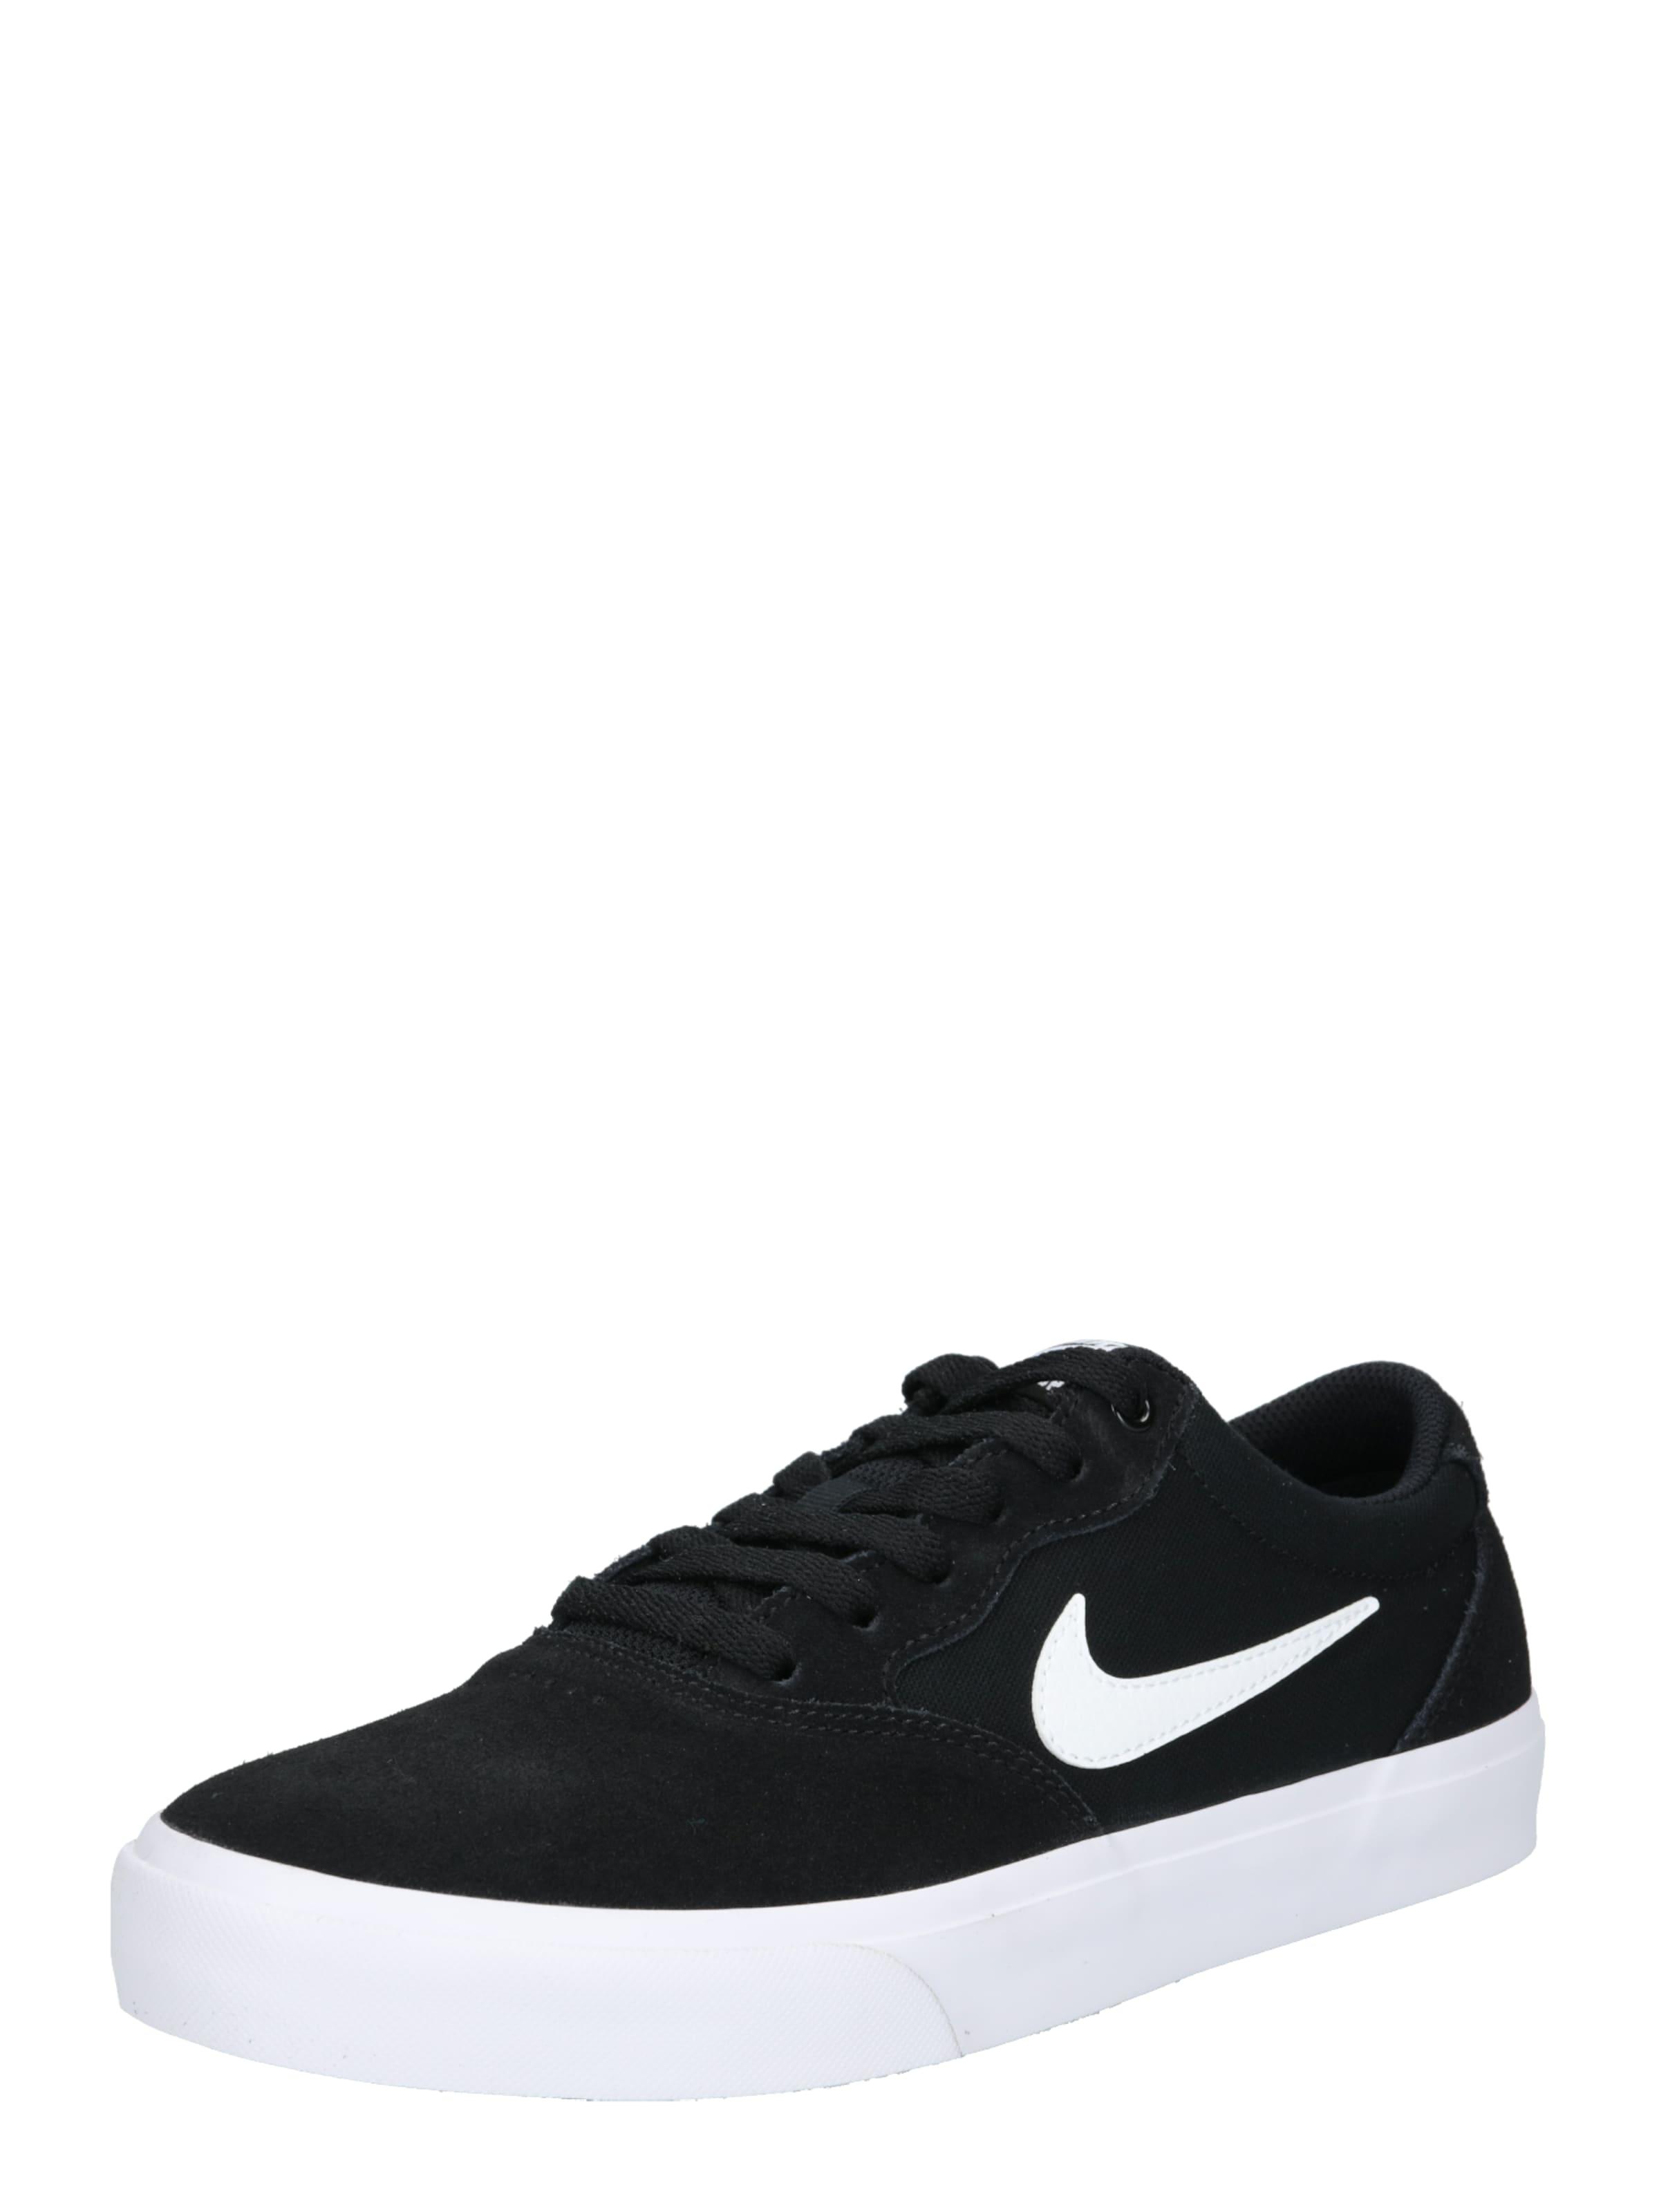 Nike Laag Sb In Sneakers 'chron' ZwartWit 3RjAL54